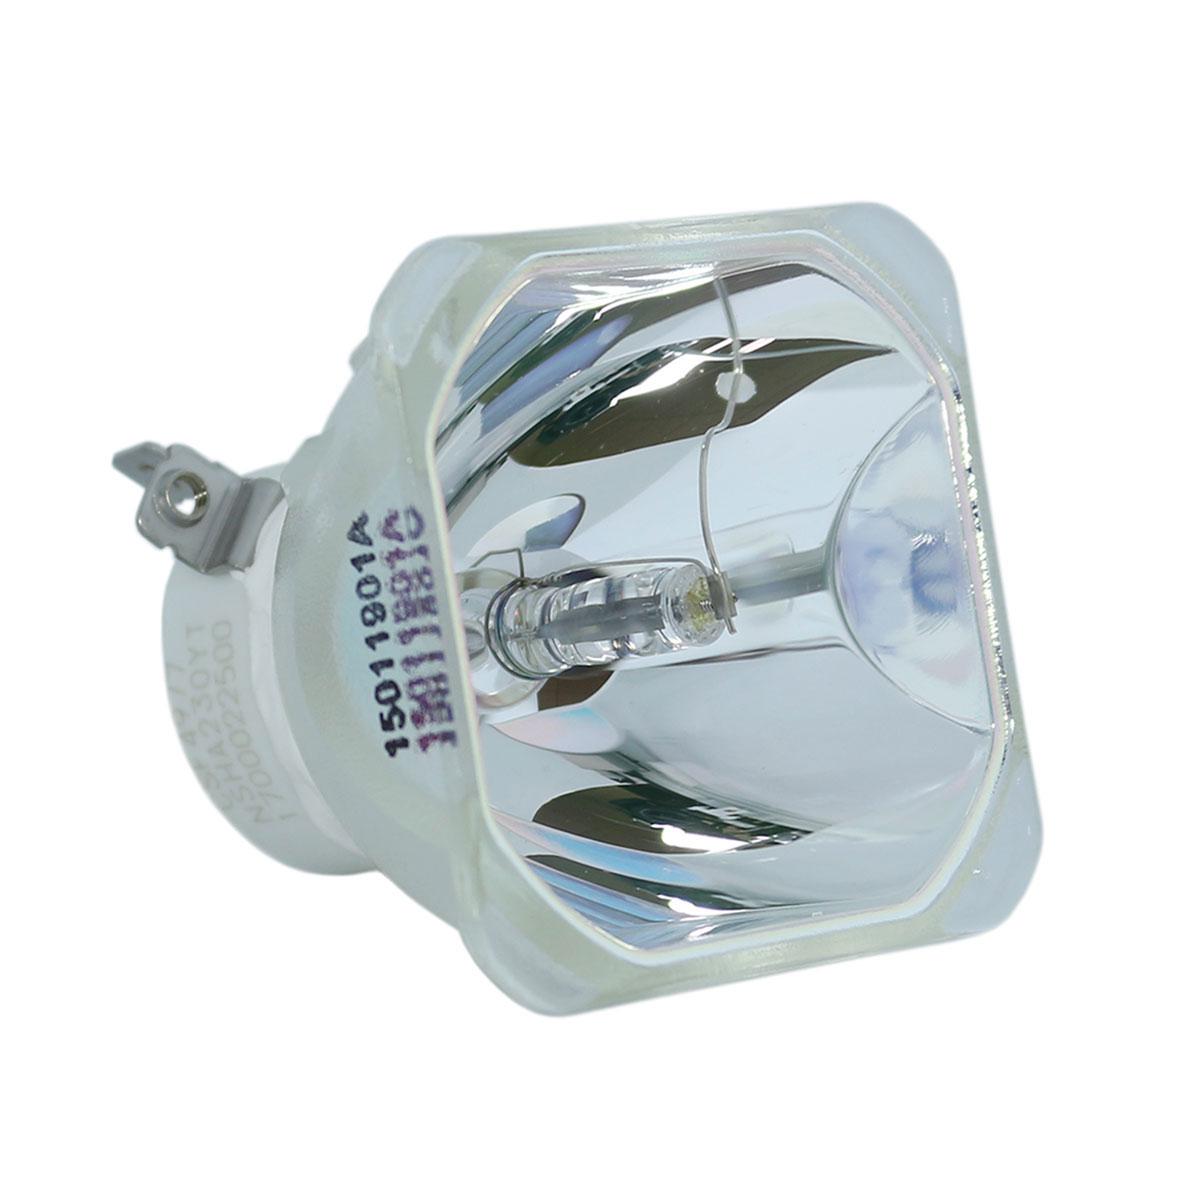 ET-LAV300 for Panasonic PT-VX42Z PT-VW345NZ PT-W355N PT-VX420 PTVX425 PT-VW350 PT-VW340Z PT-VX415N PT-VX410Z Projector Lamp Bulb<br>